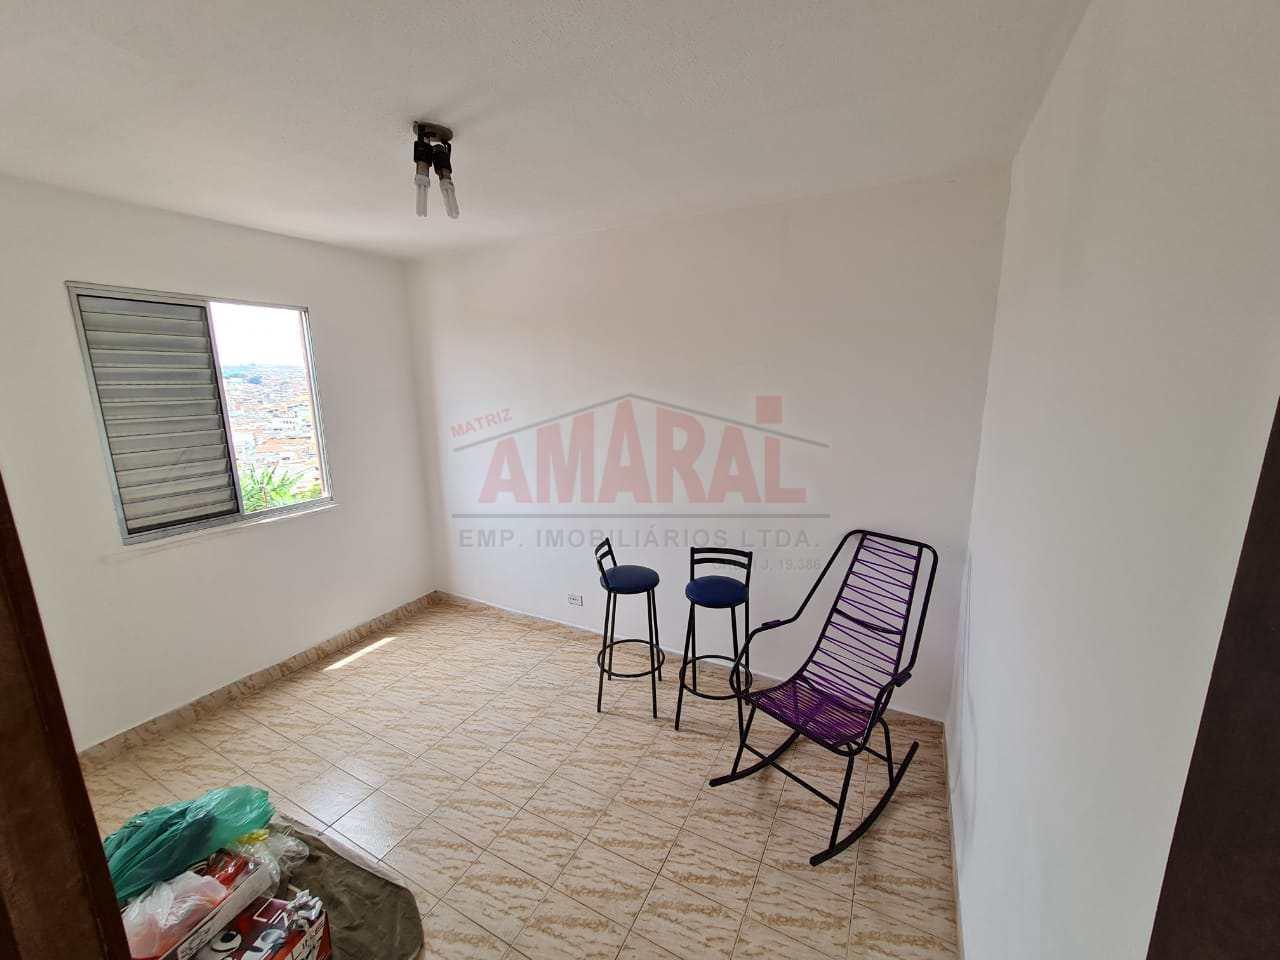 Apartamento com 2 dorms, Cidade Satélite Santa Bárbara, São Paulo - R$ 160 mil, Cod: 11342